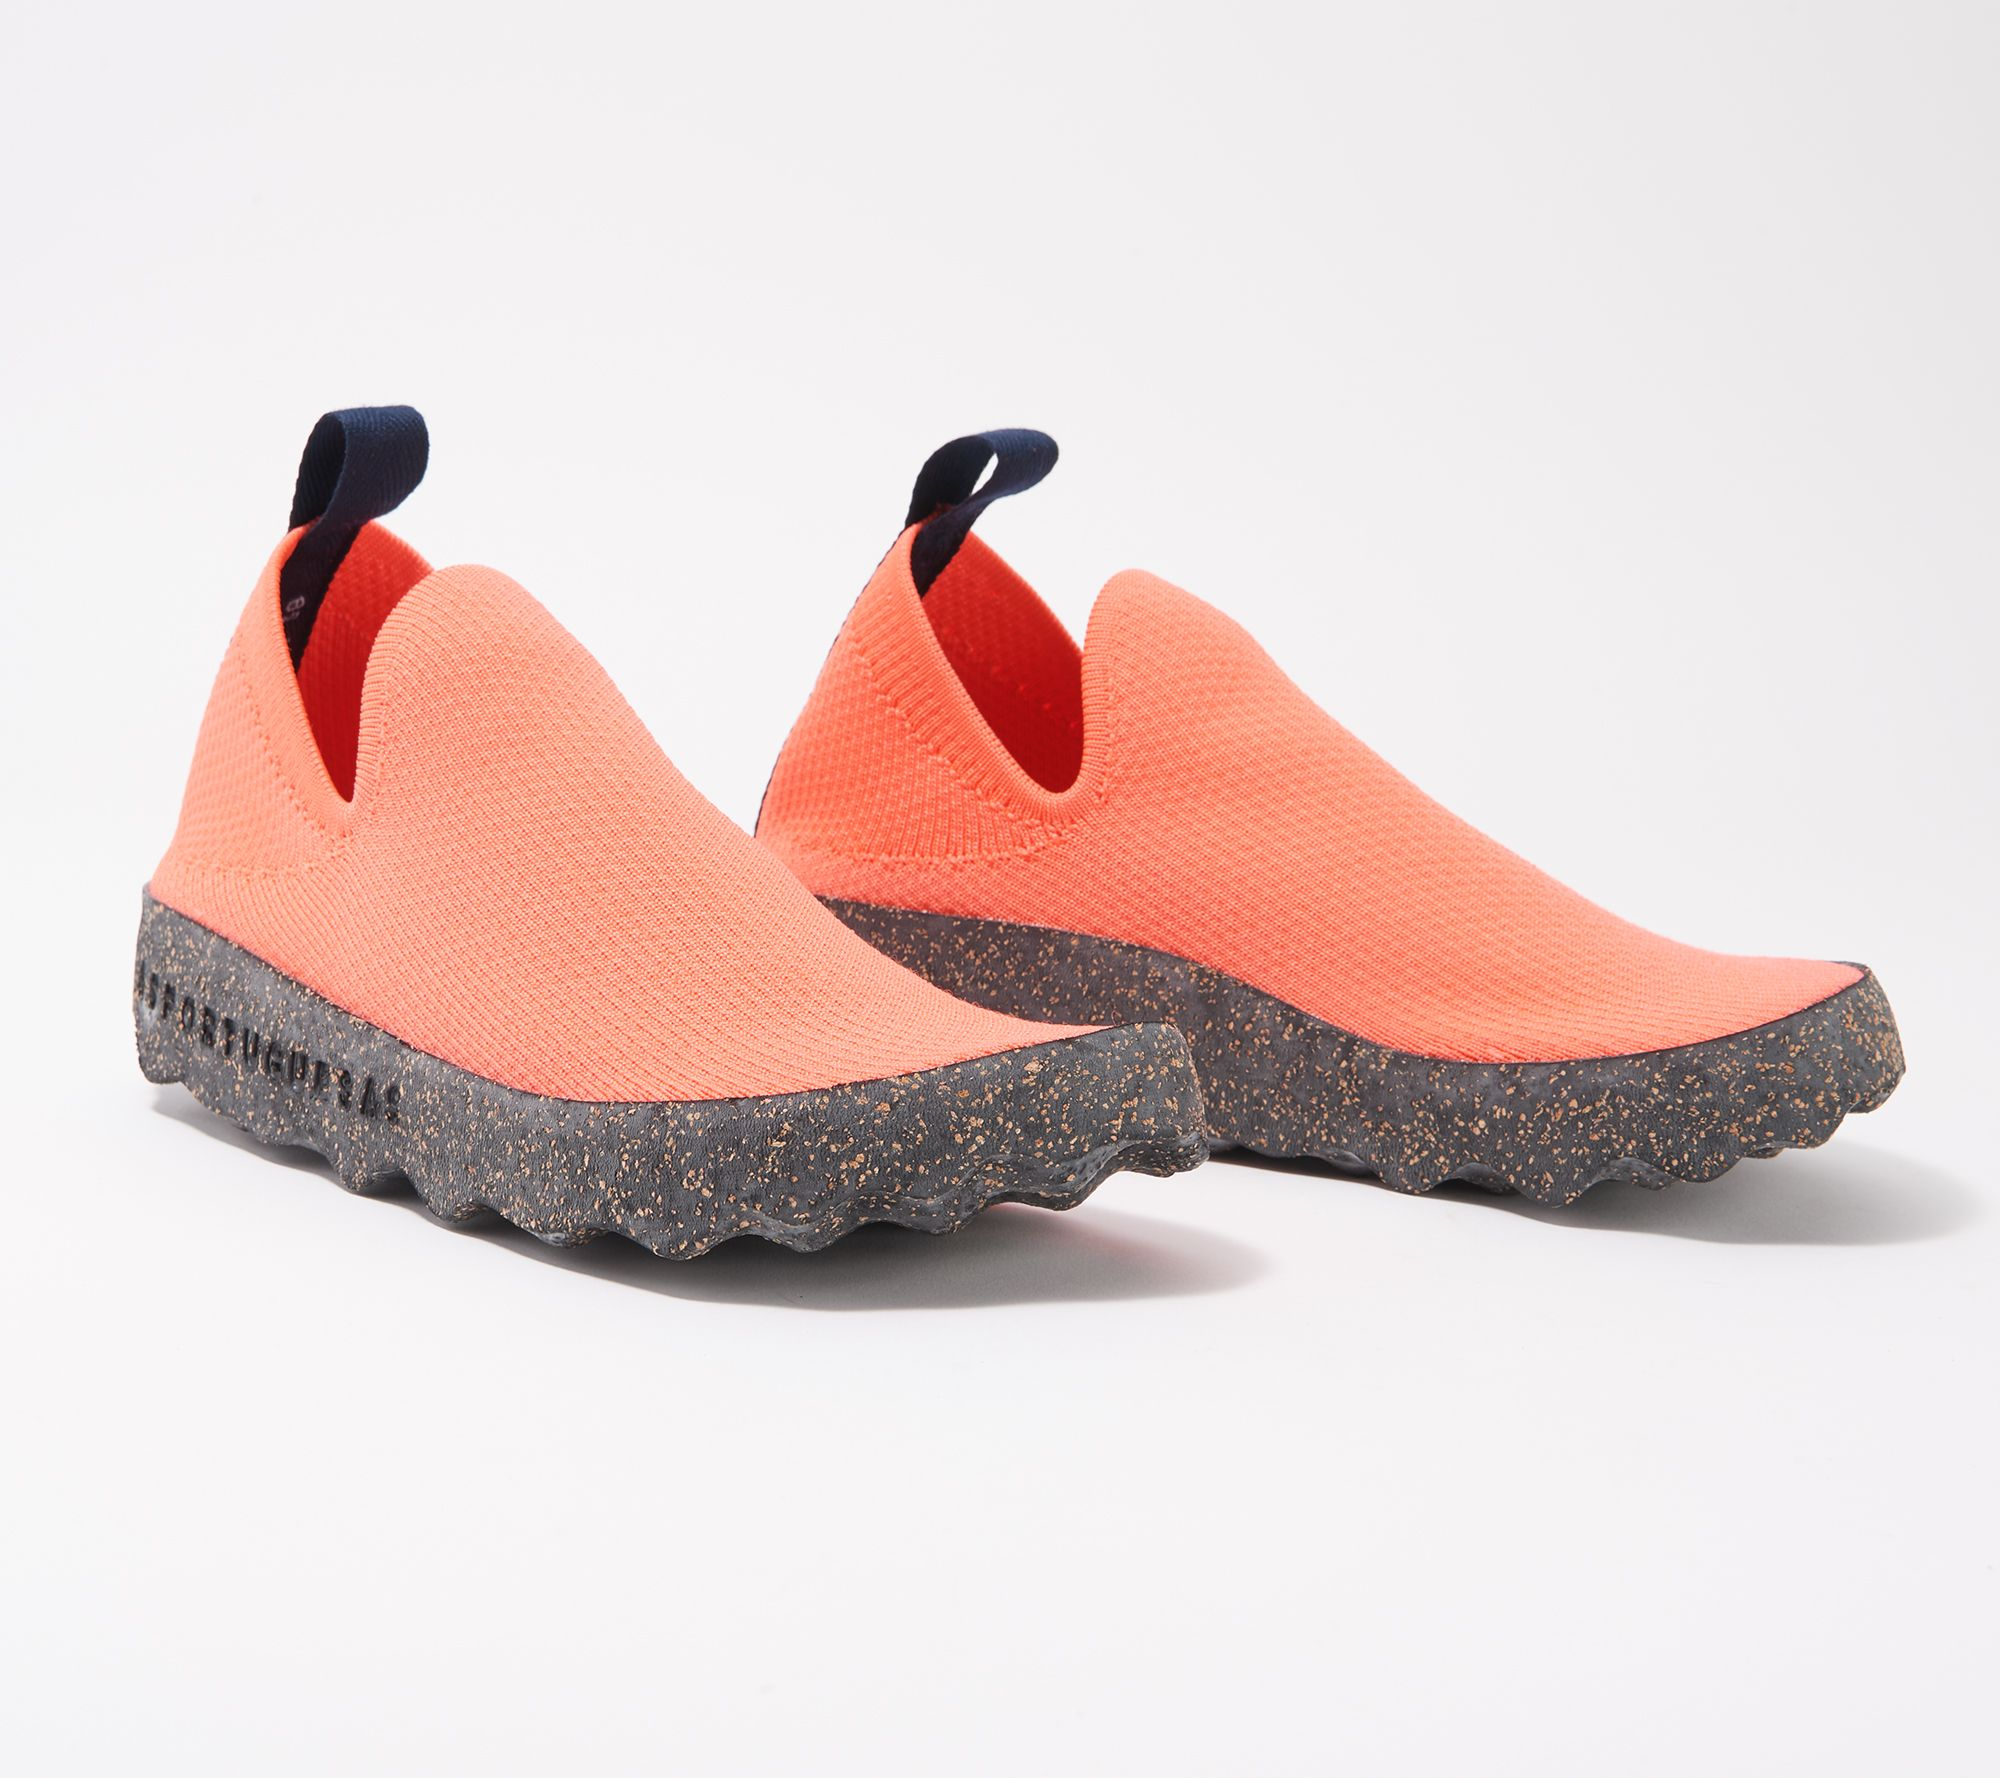 Copper Fit Womens Merry Mesh Slip On Shoe Sneaker Grey Size 10 M US